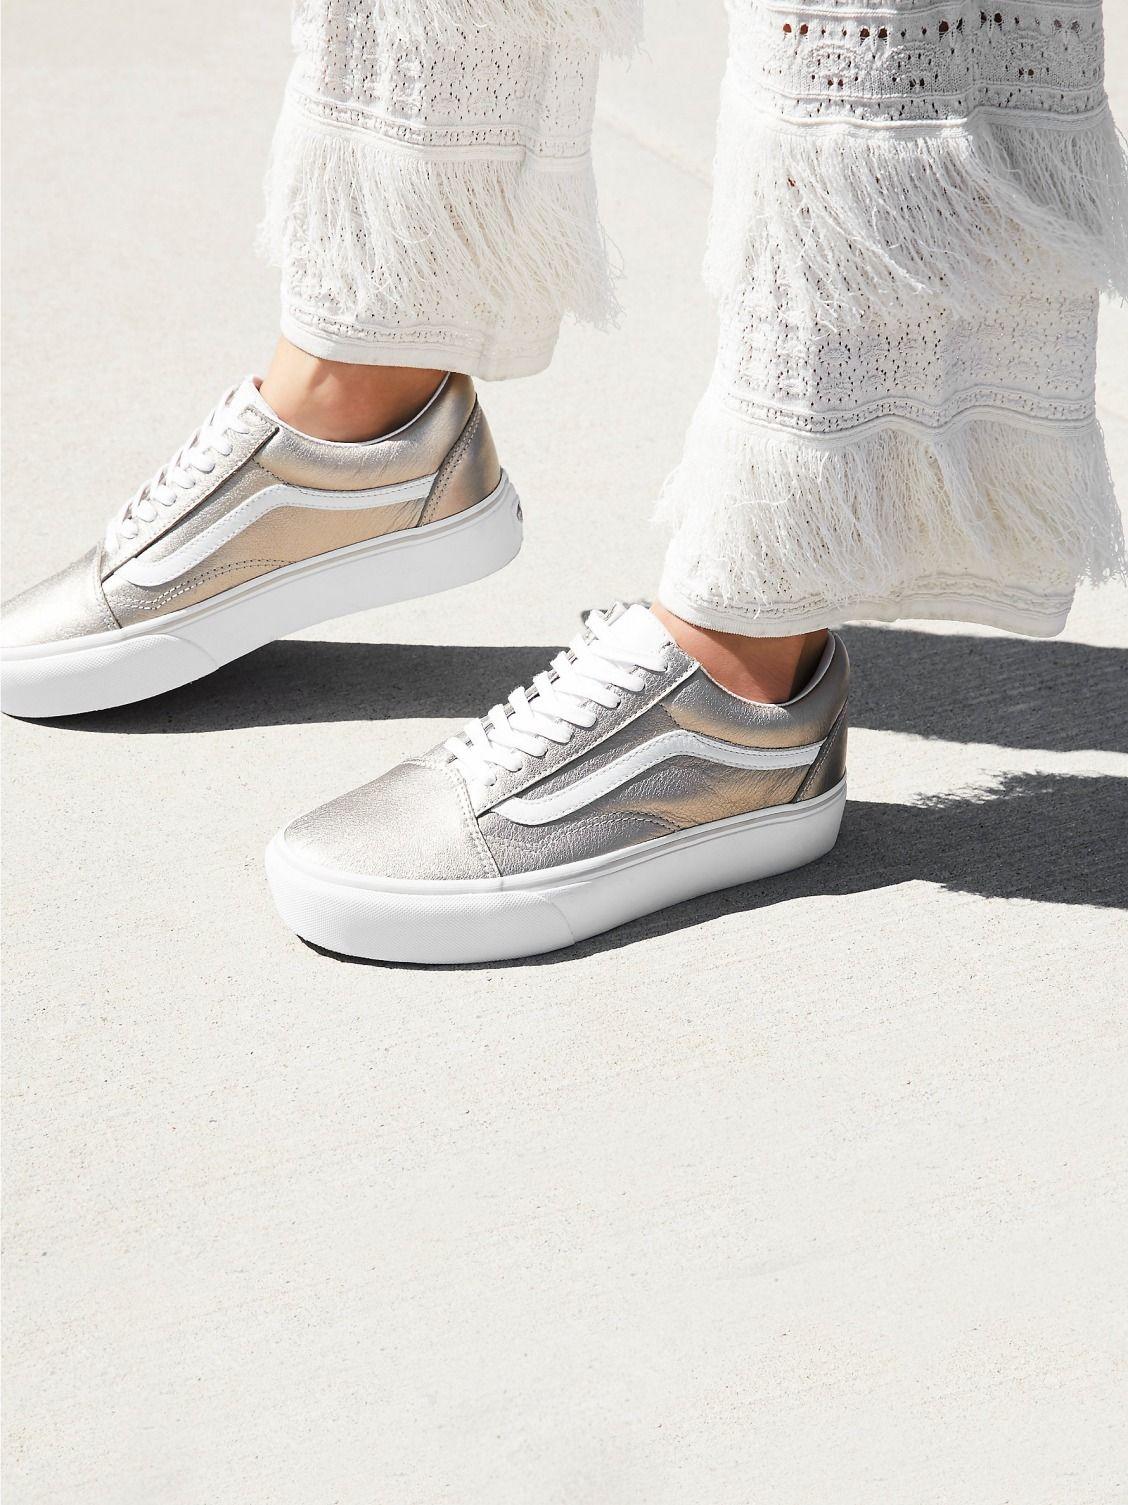 Vans Grey Gold Old Skool Platform Sneaker At Free People Clothing Boutique Platform Sneakers Shoes Vans Shoes